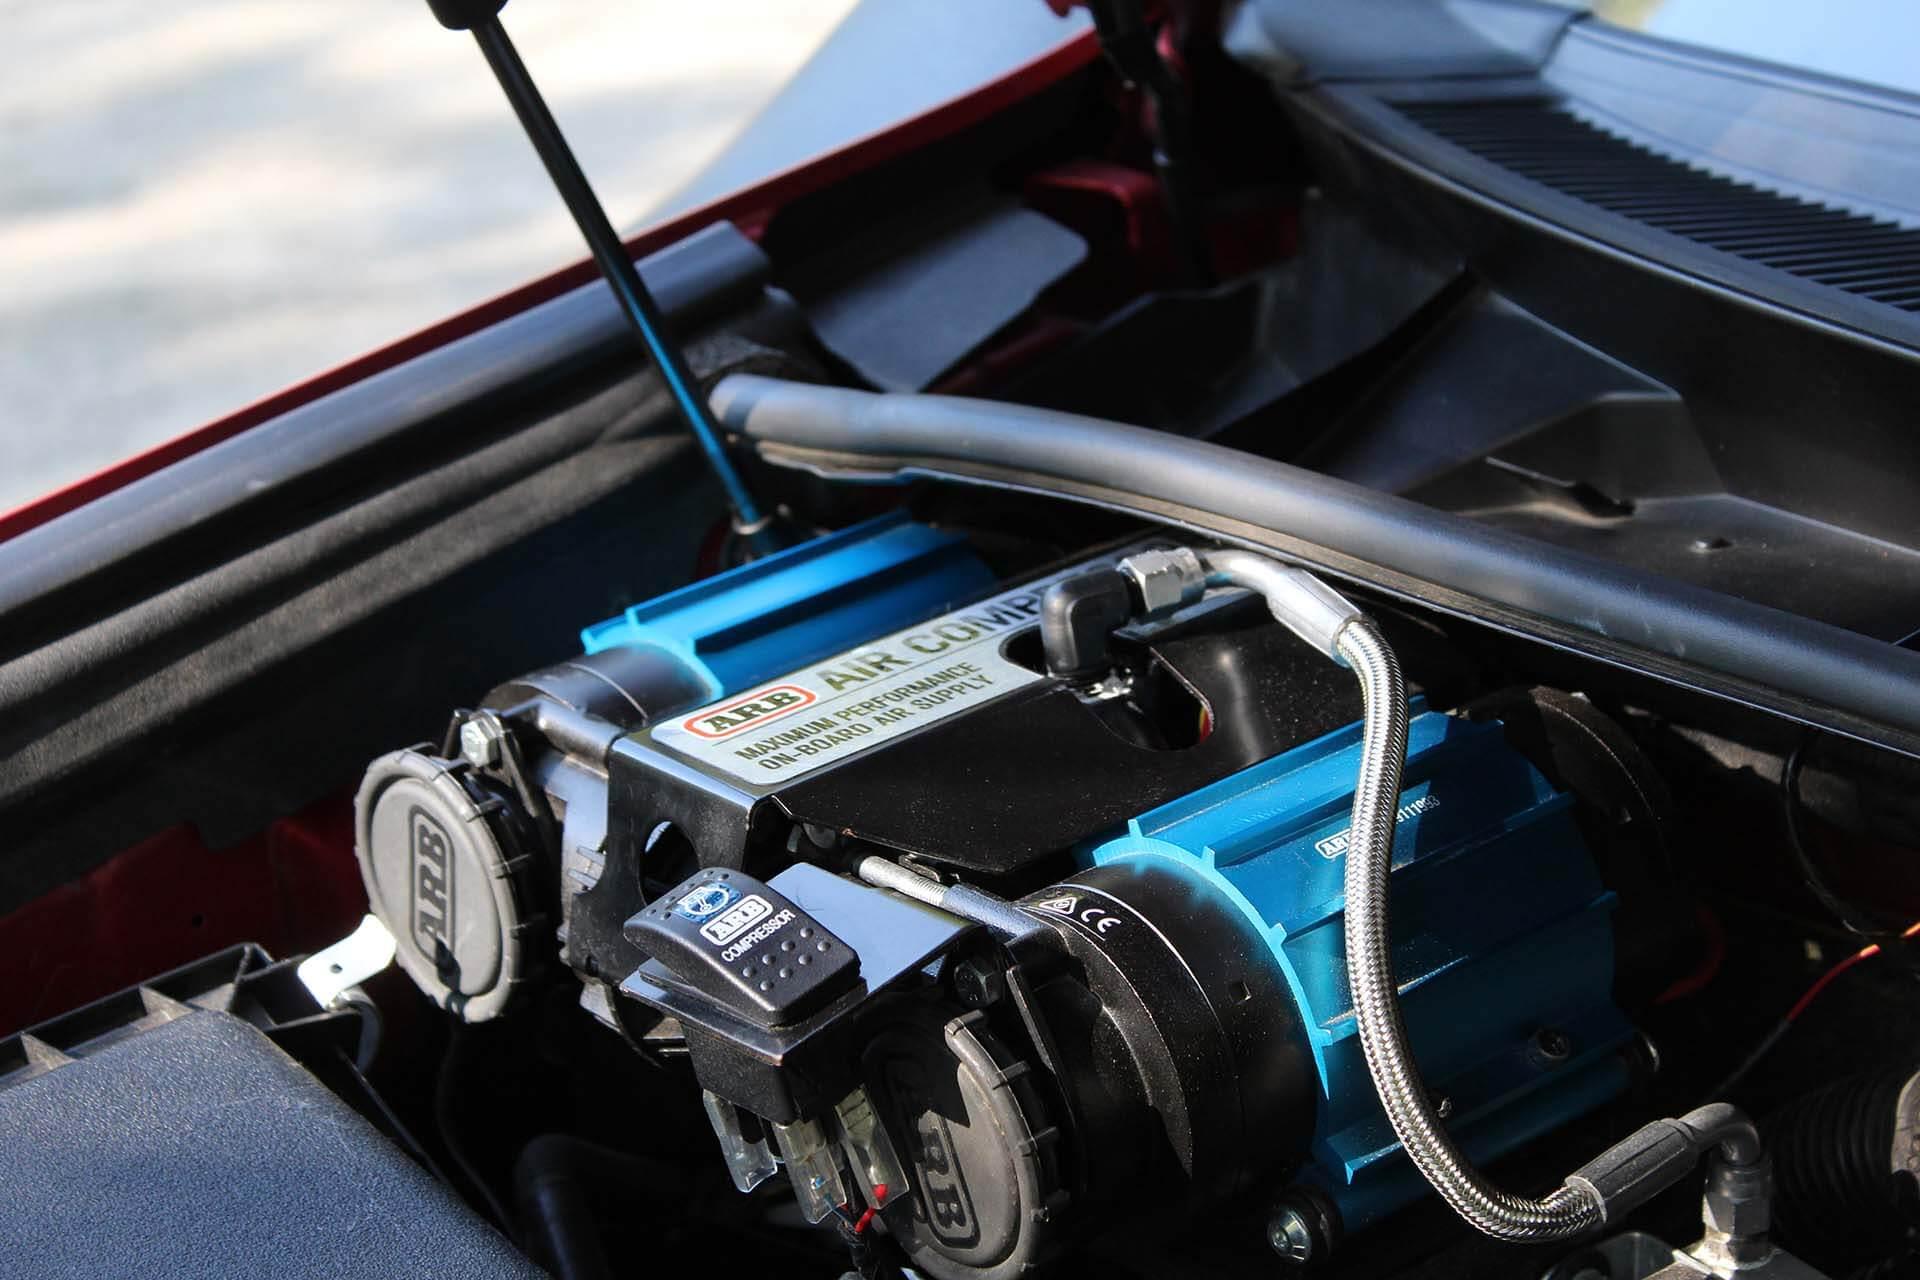 Toyota 4Runner Compressor